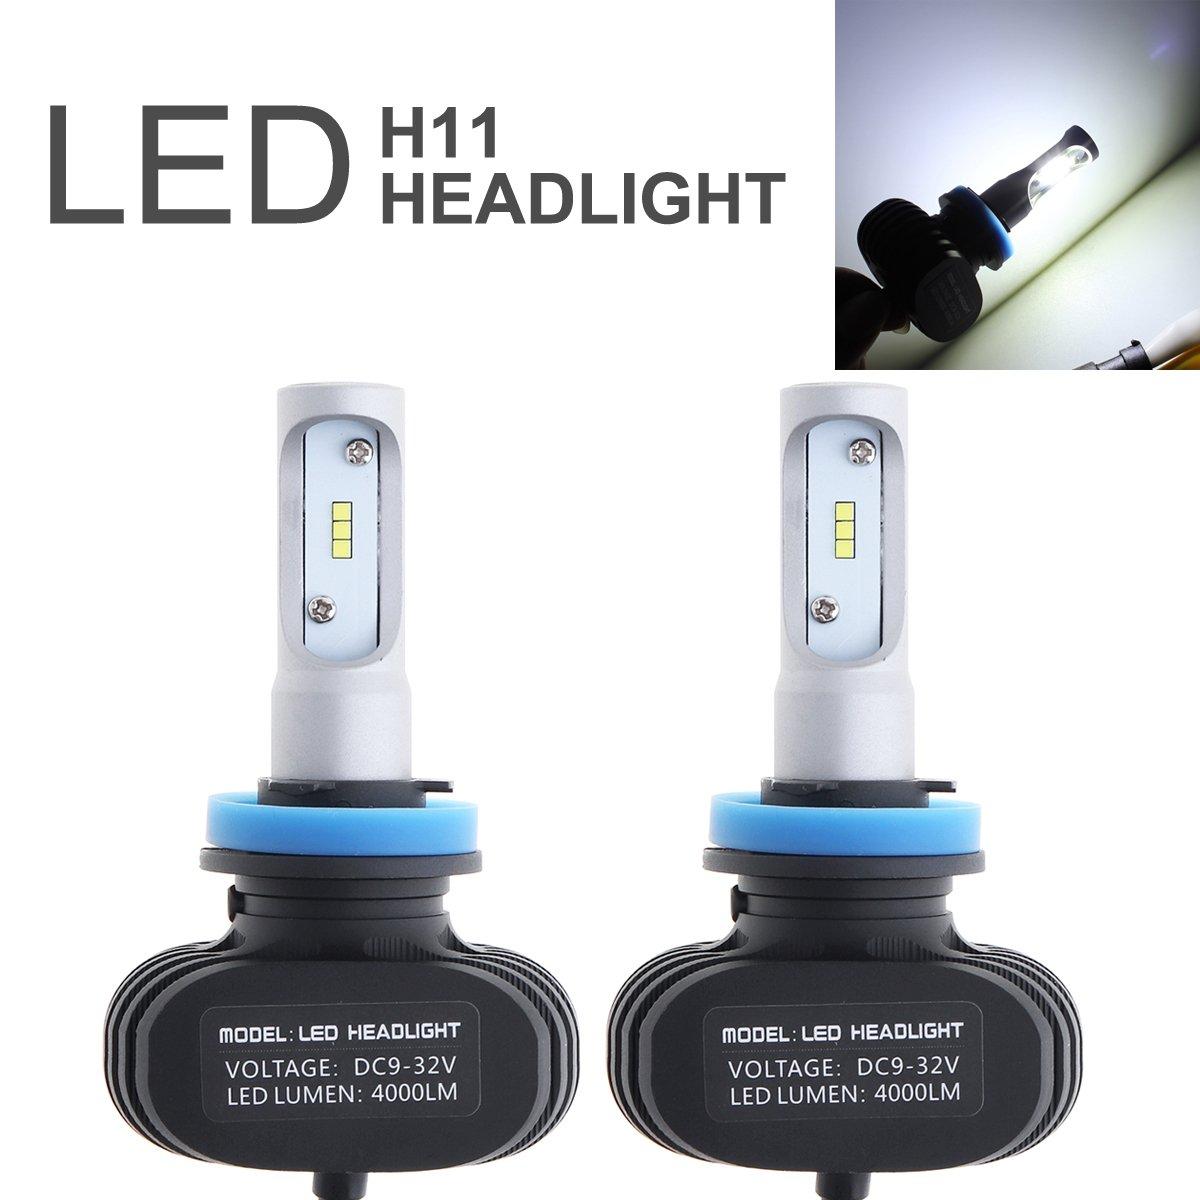 ePathChina 2Pcs H11 LED Headlight Bulb, 50W 8000LM 6000K Auto Car Light CSP Chips Conversion Kit Automobile Fog Lamp